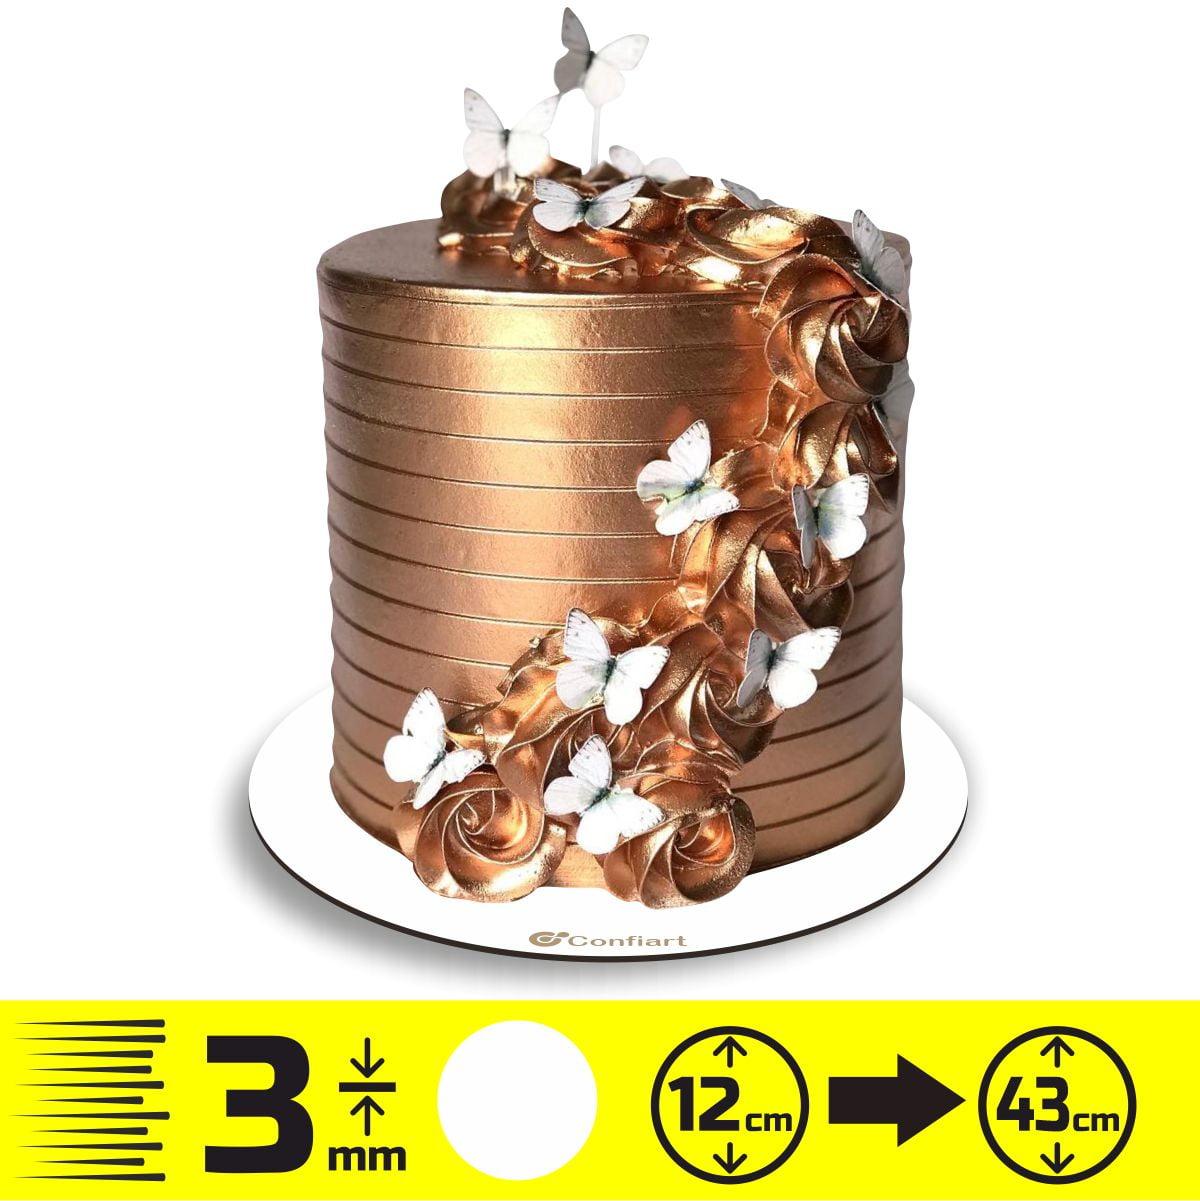 Cake board redondo 3mm